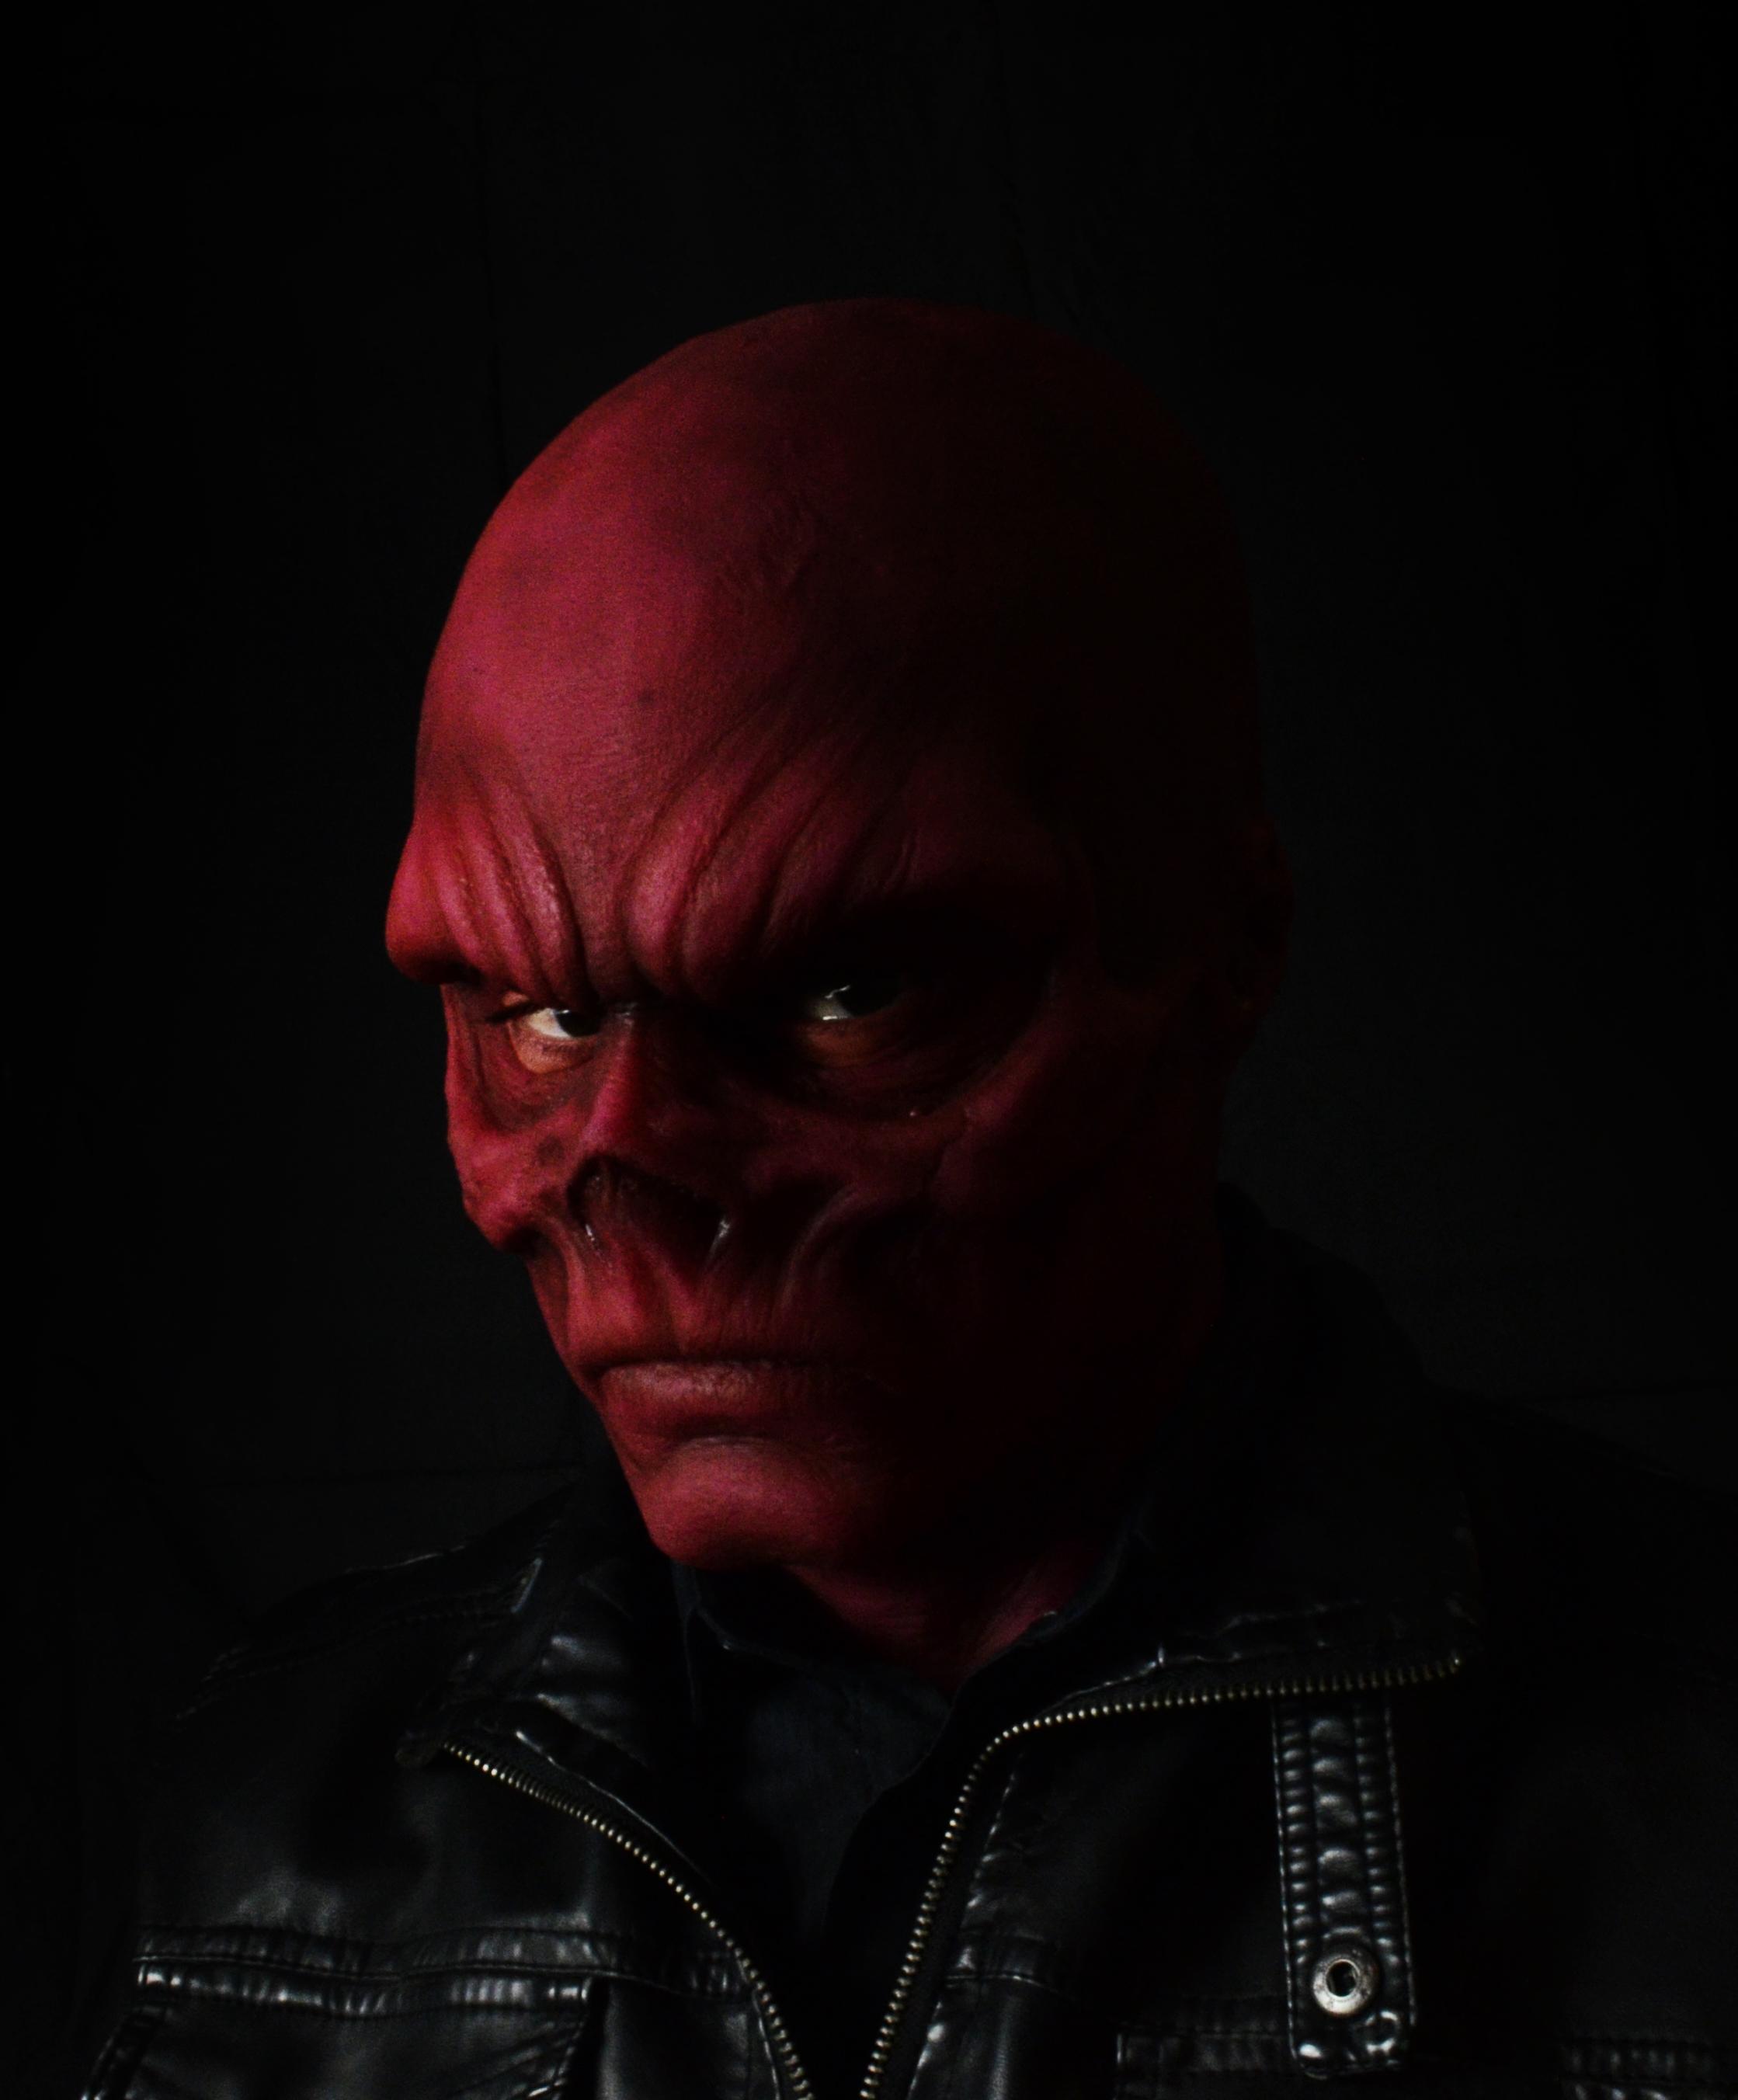 Red Skull 1.jpg